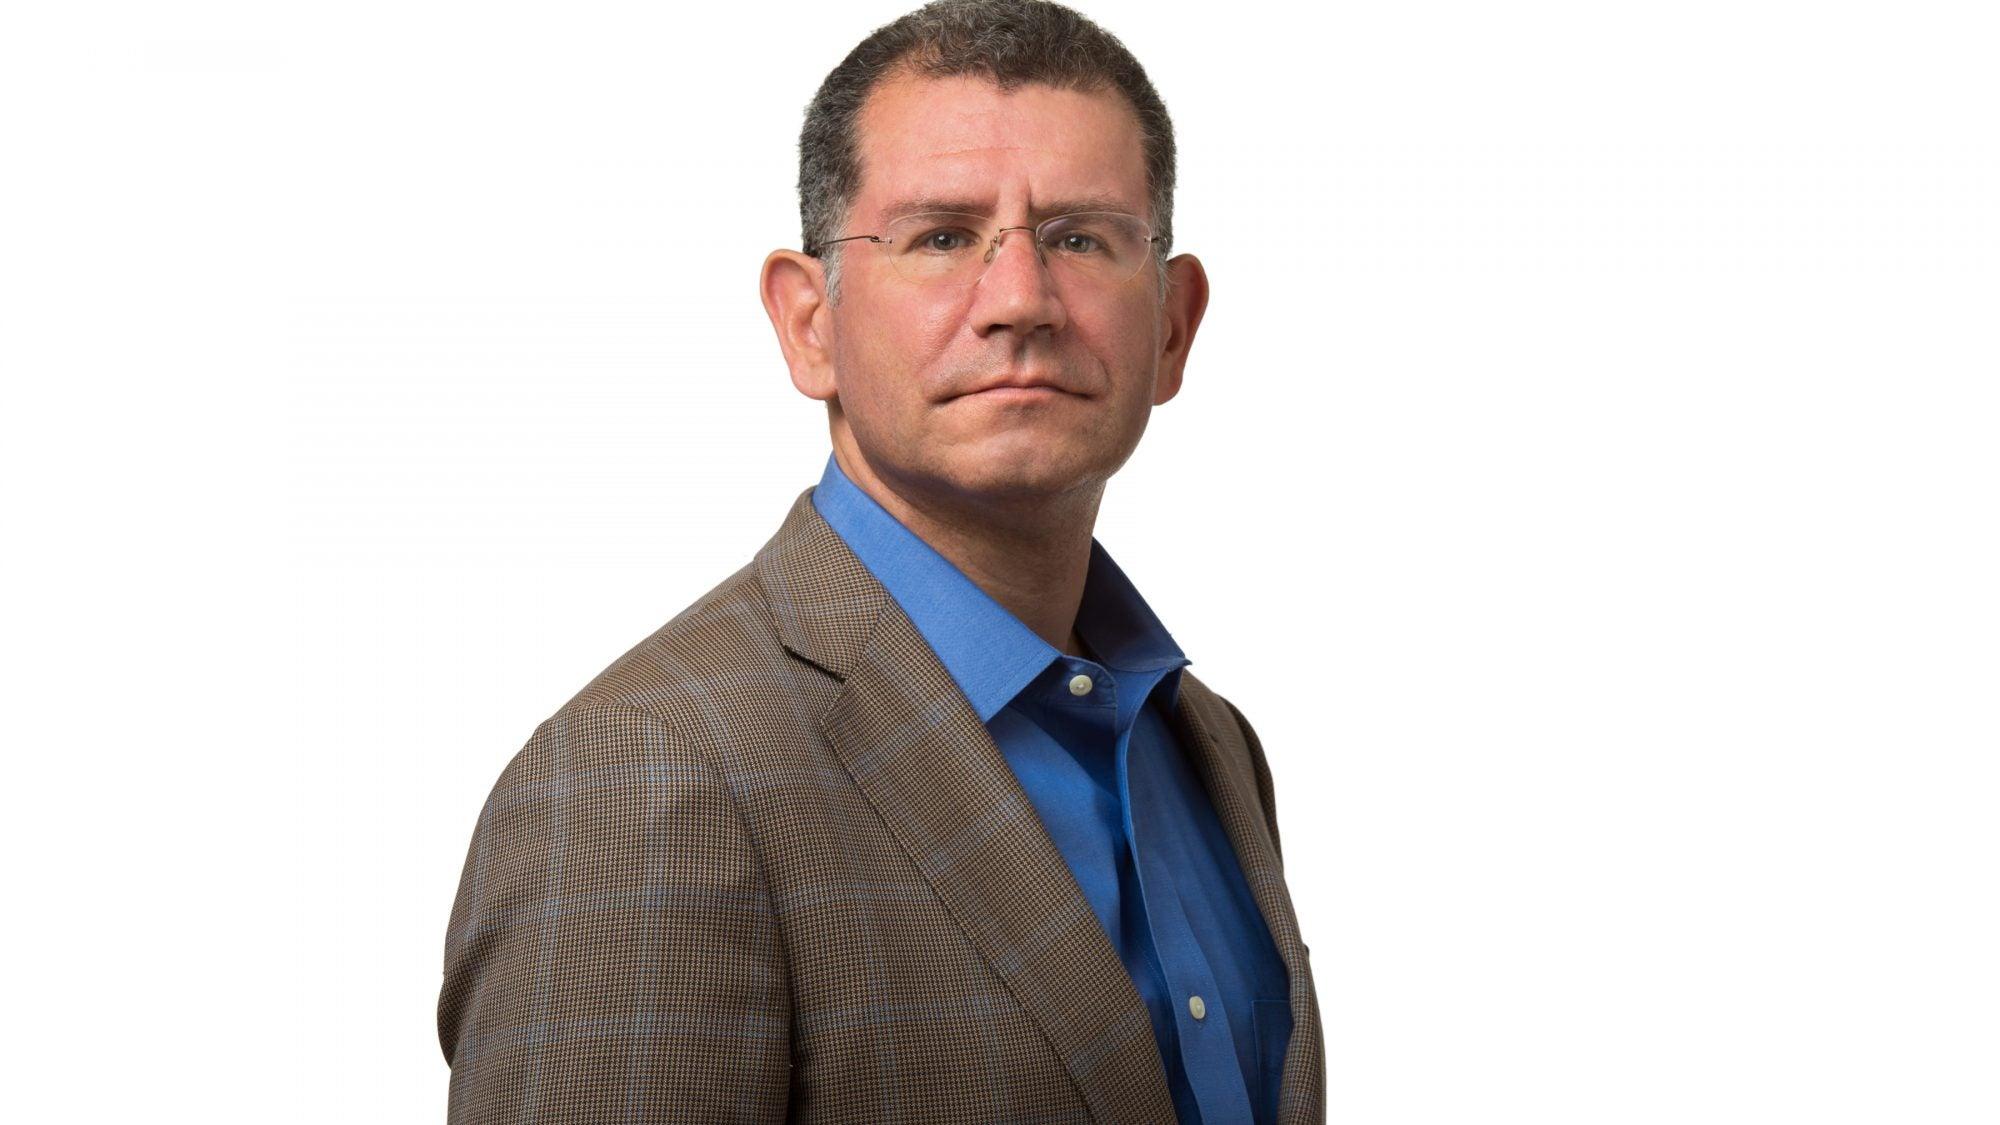 Dr. Kenneth Pollack